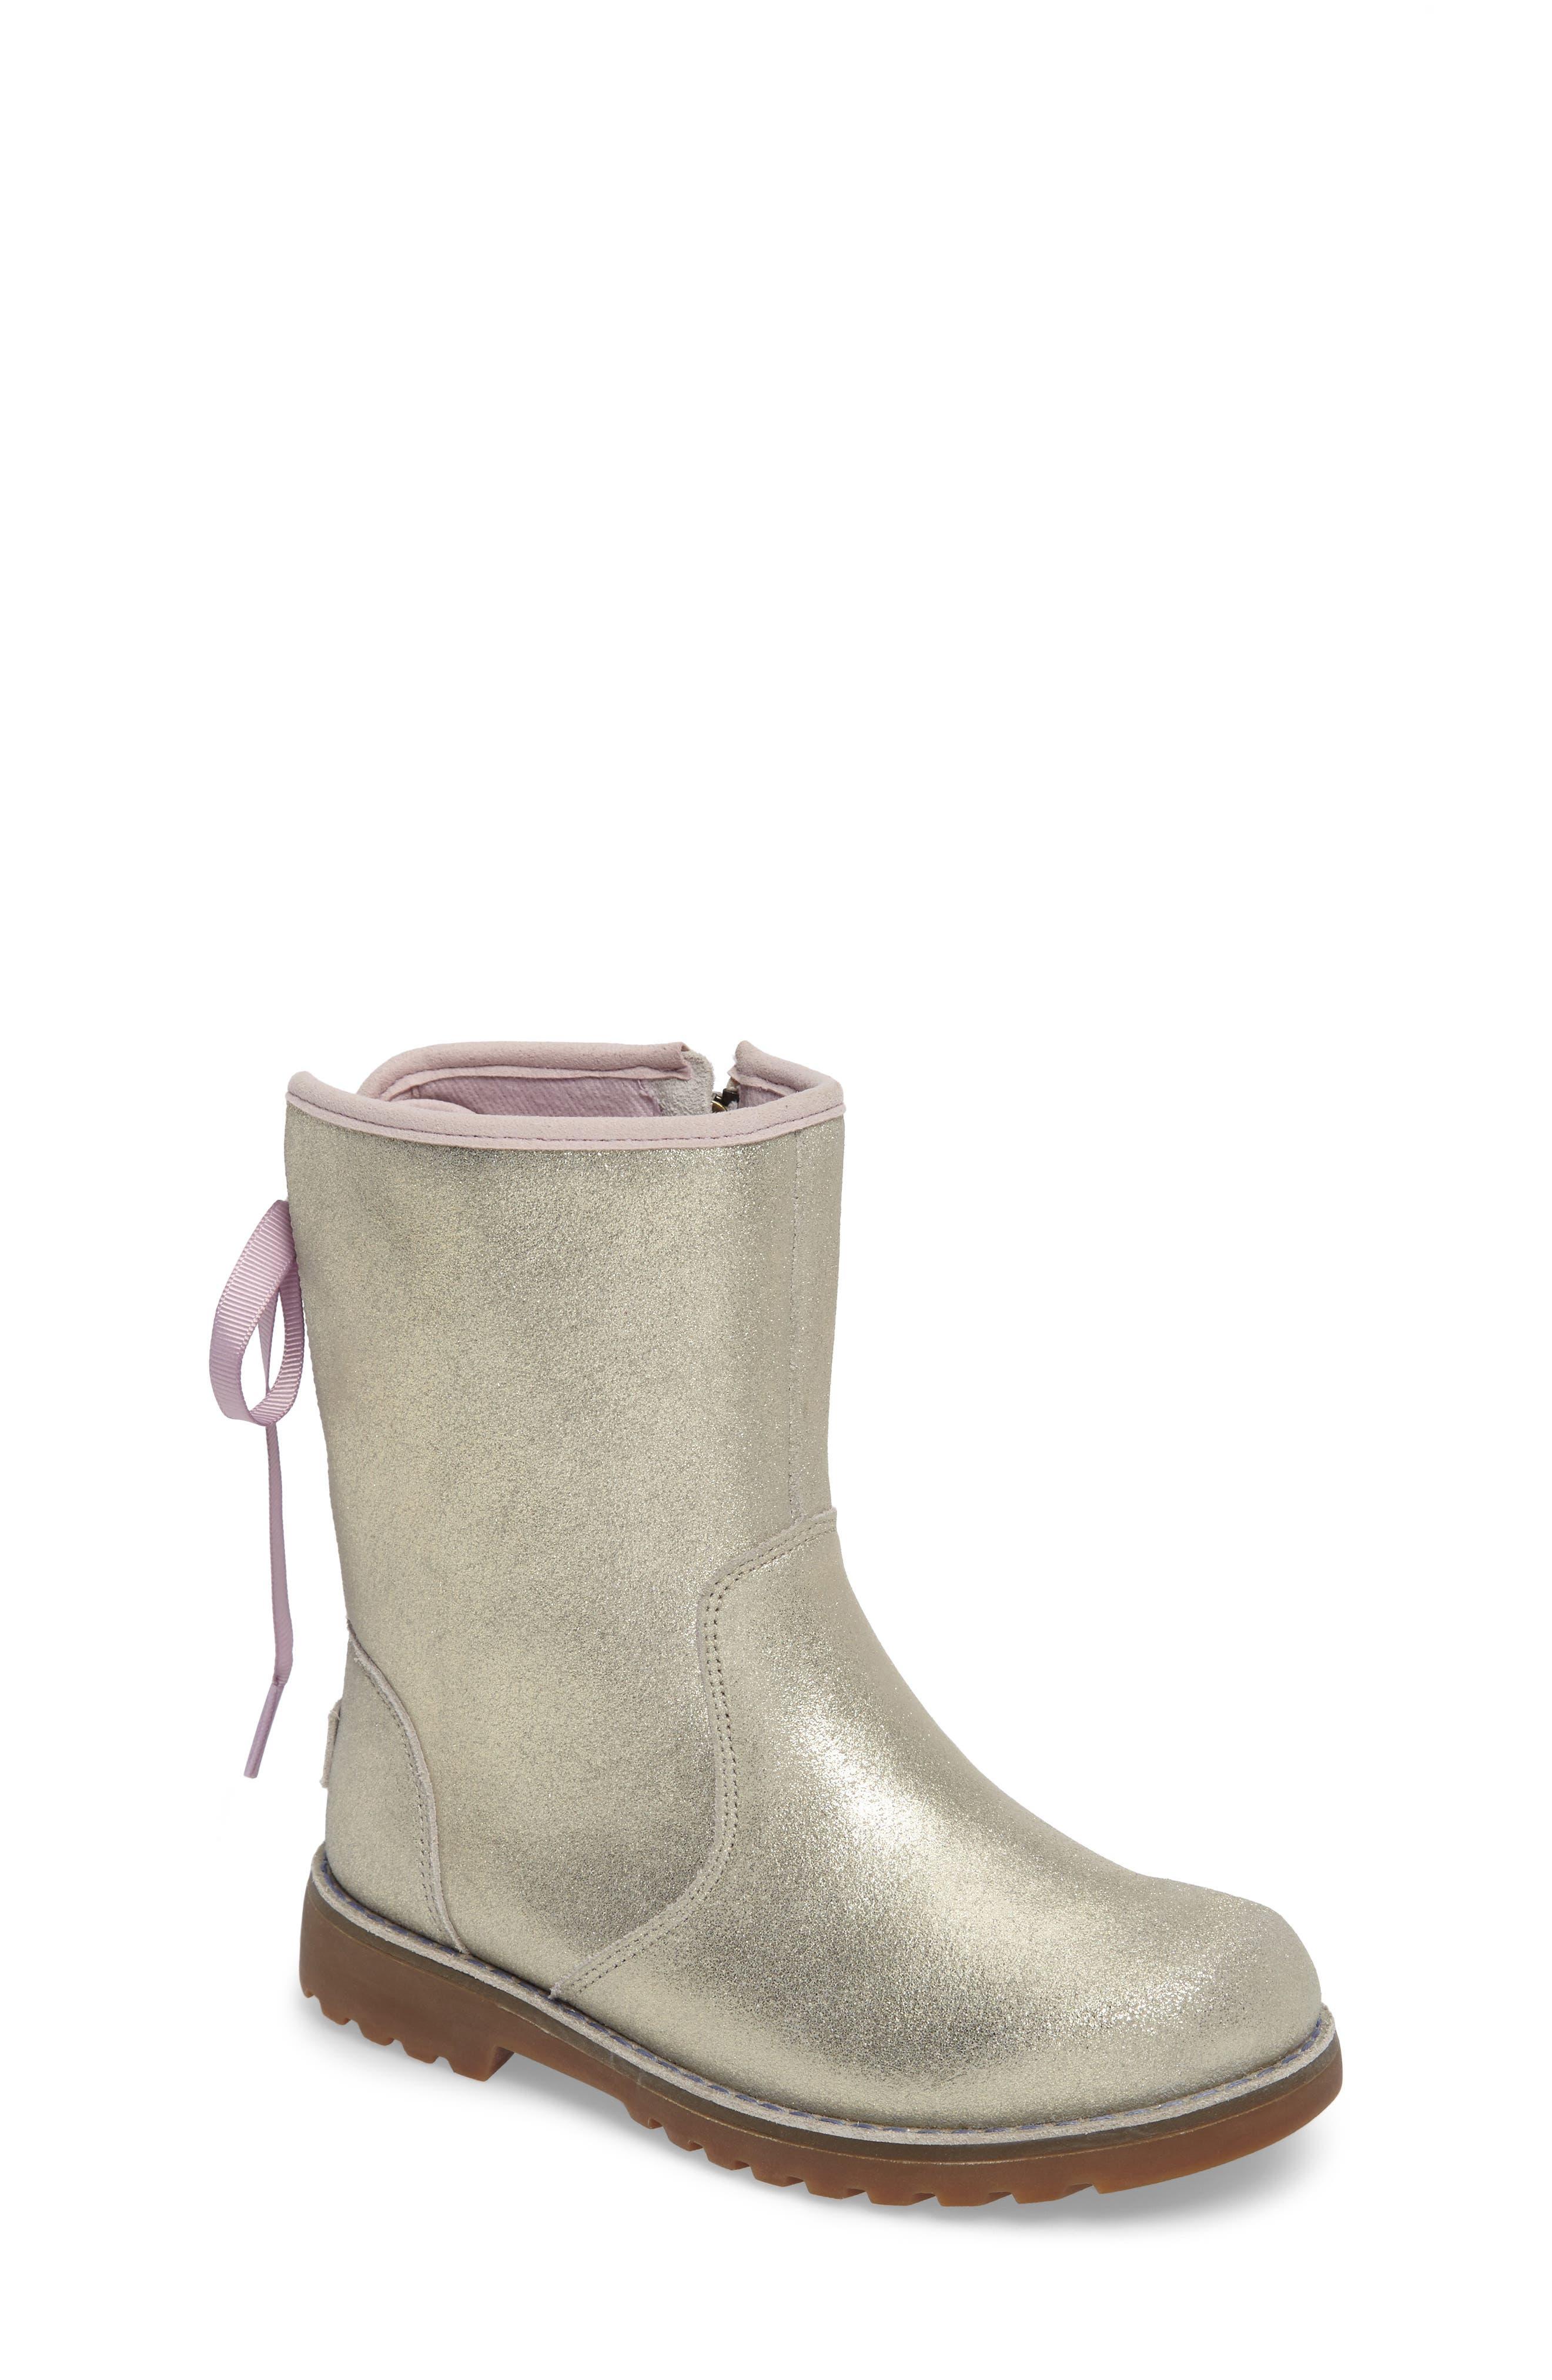 Main Image - UGG® Corene Metallic Boot (Walker, Toddler, Little Kid & Big Kid)